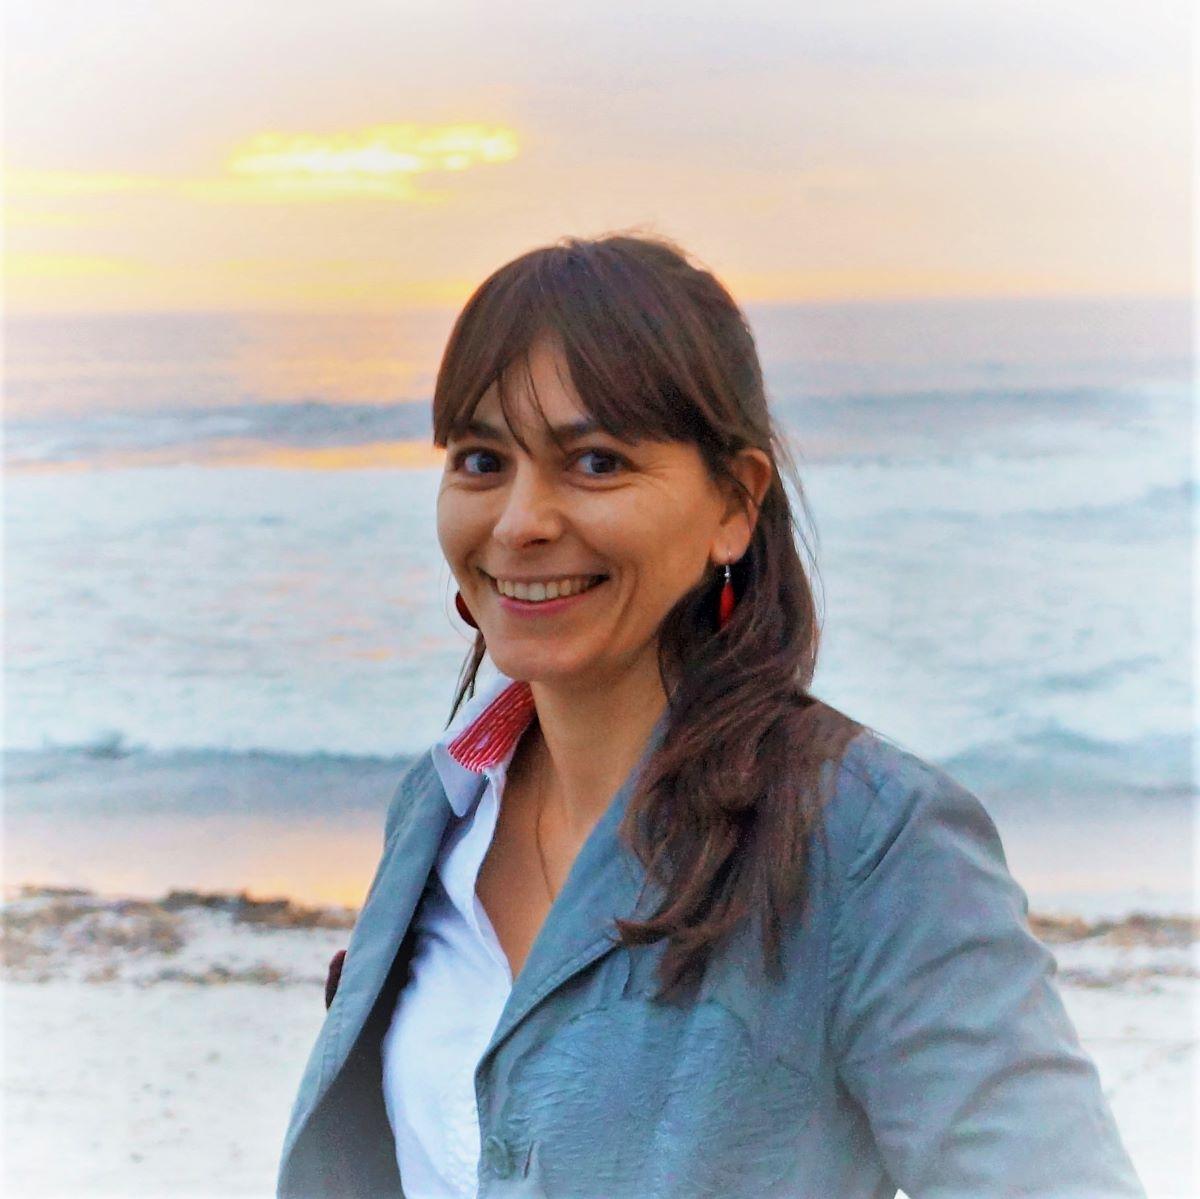 Diana Sousa